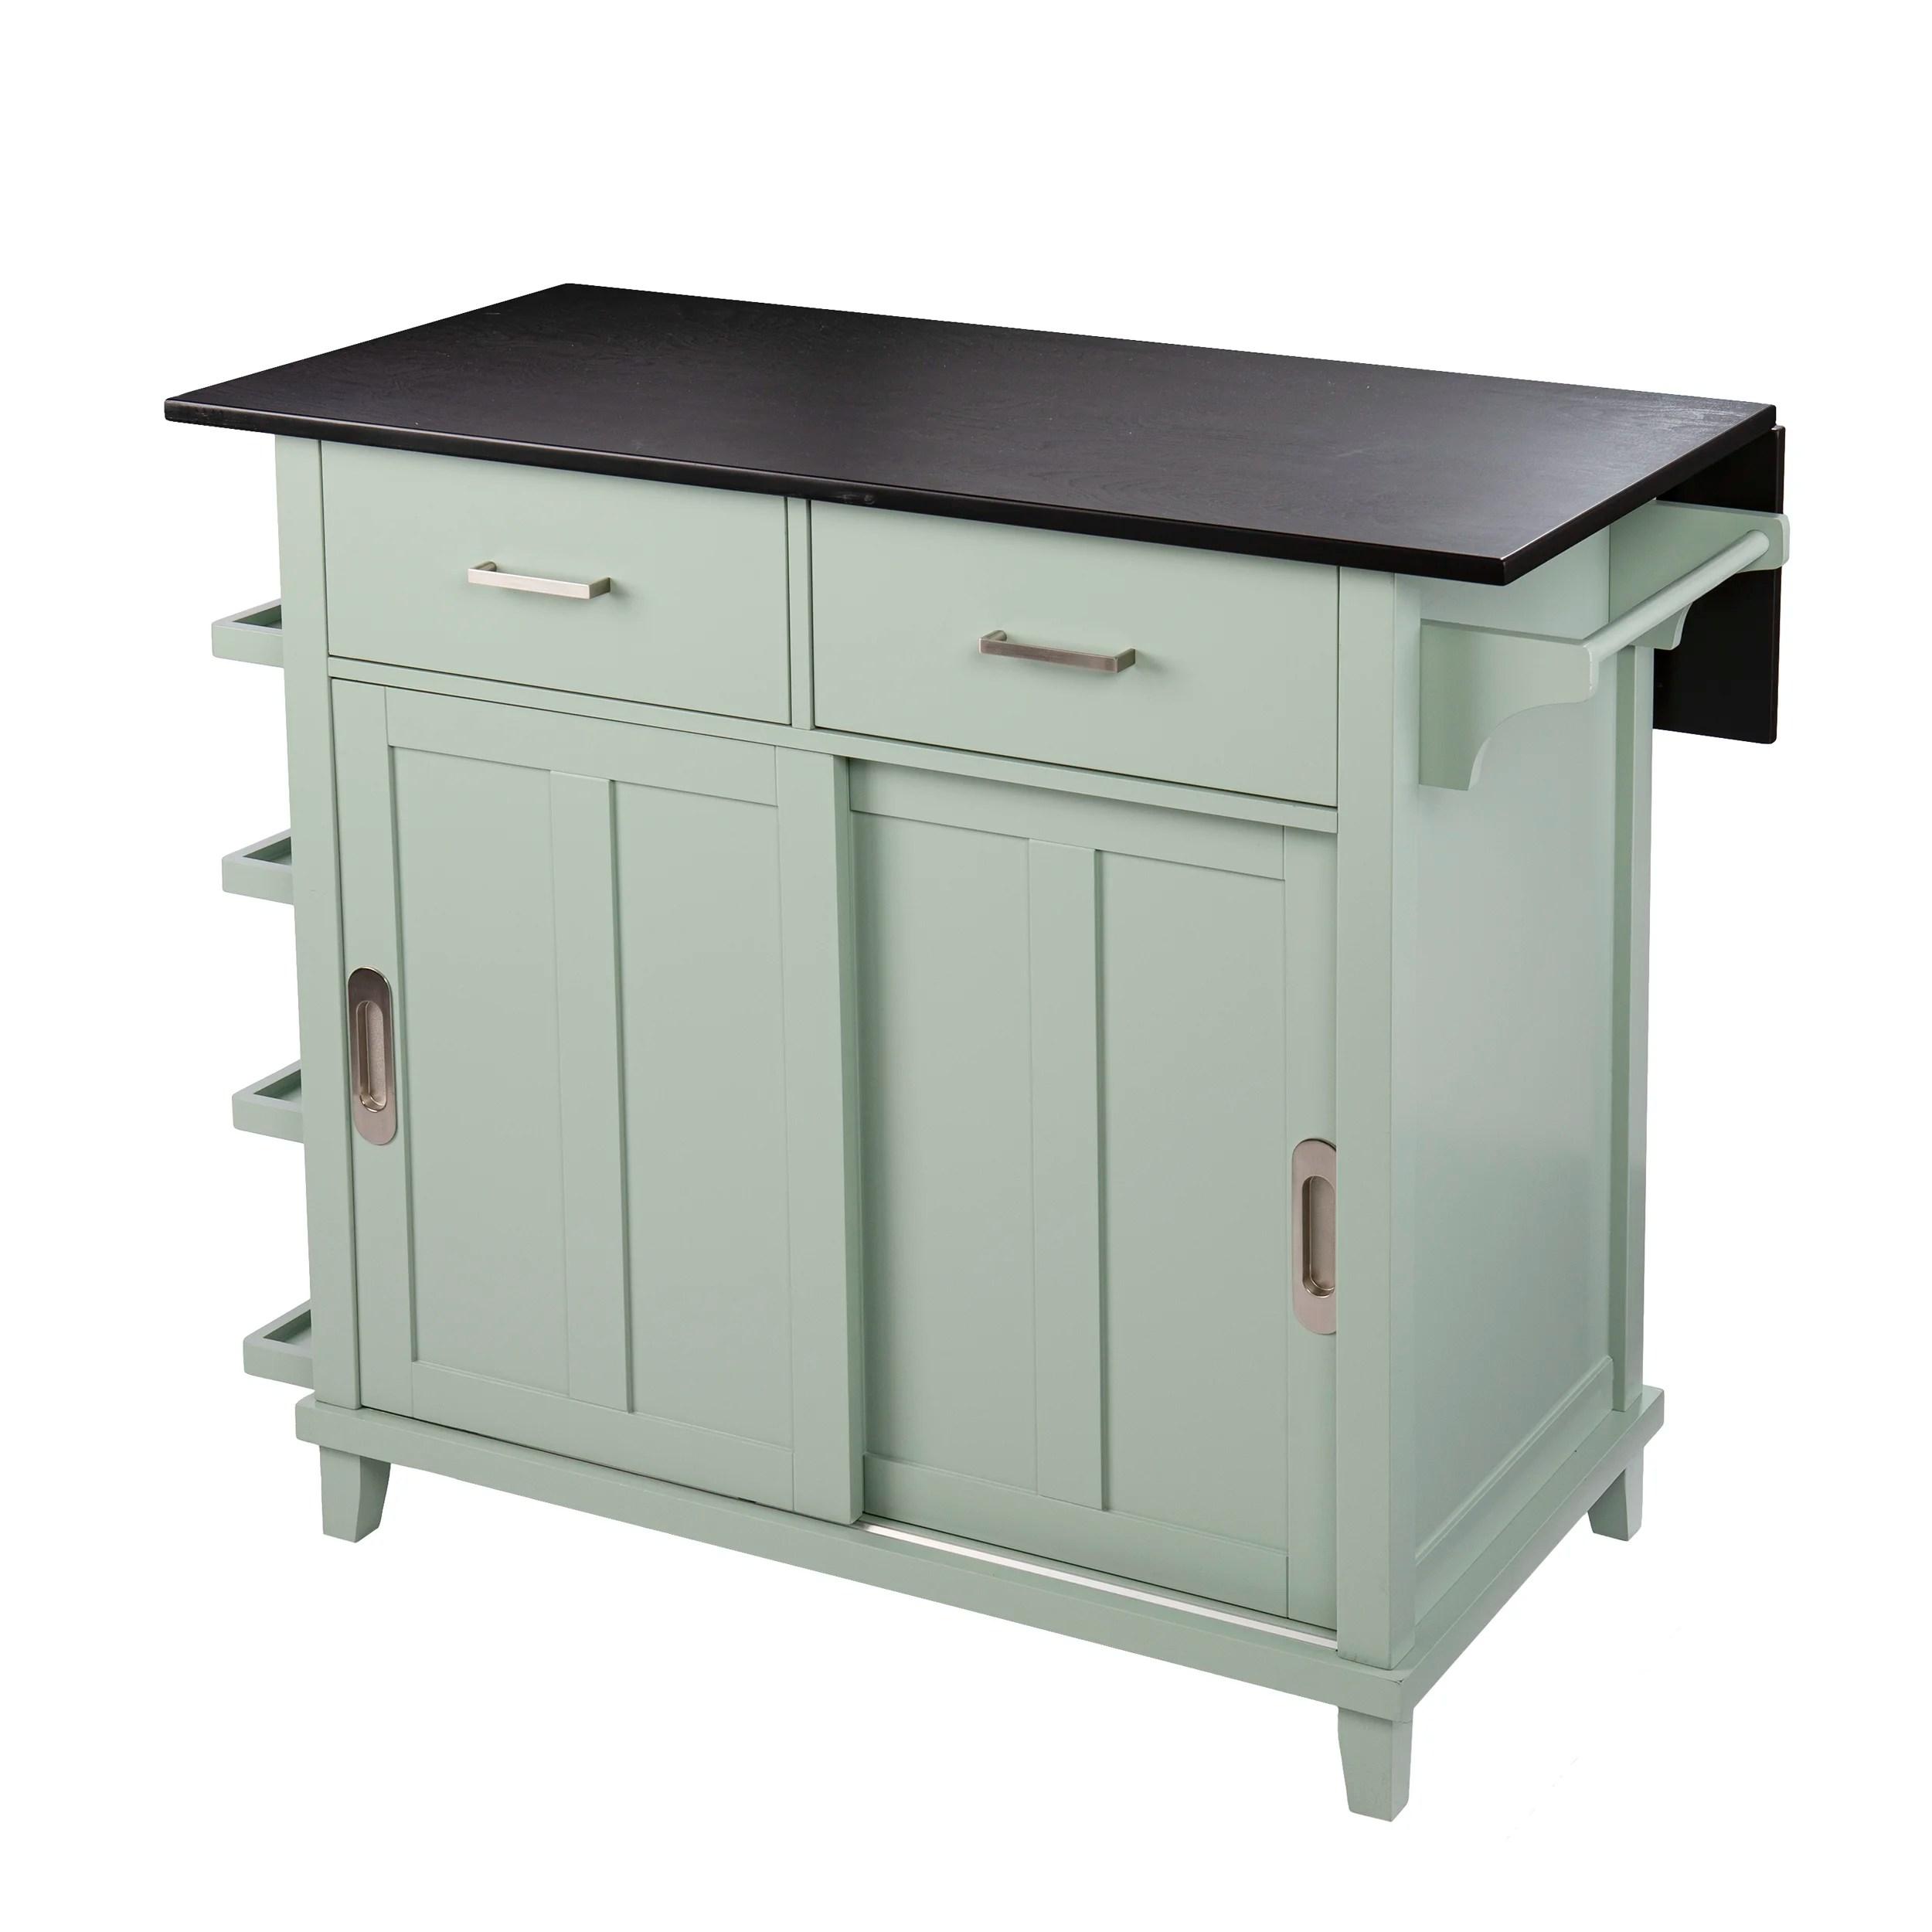 Longshore Tides Ollerton Freestanding Kitchen Island Mint Green And Black Reviews